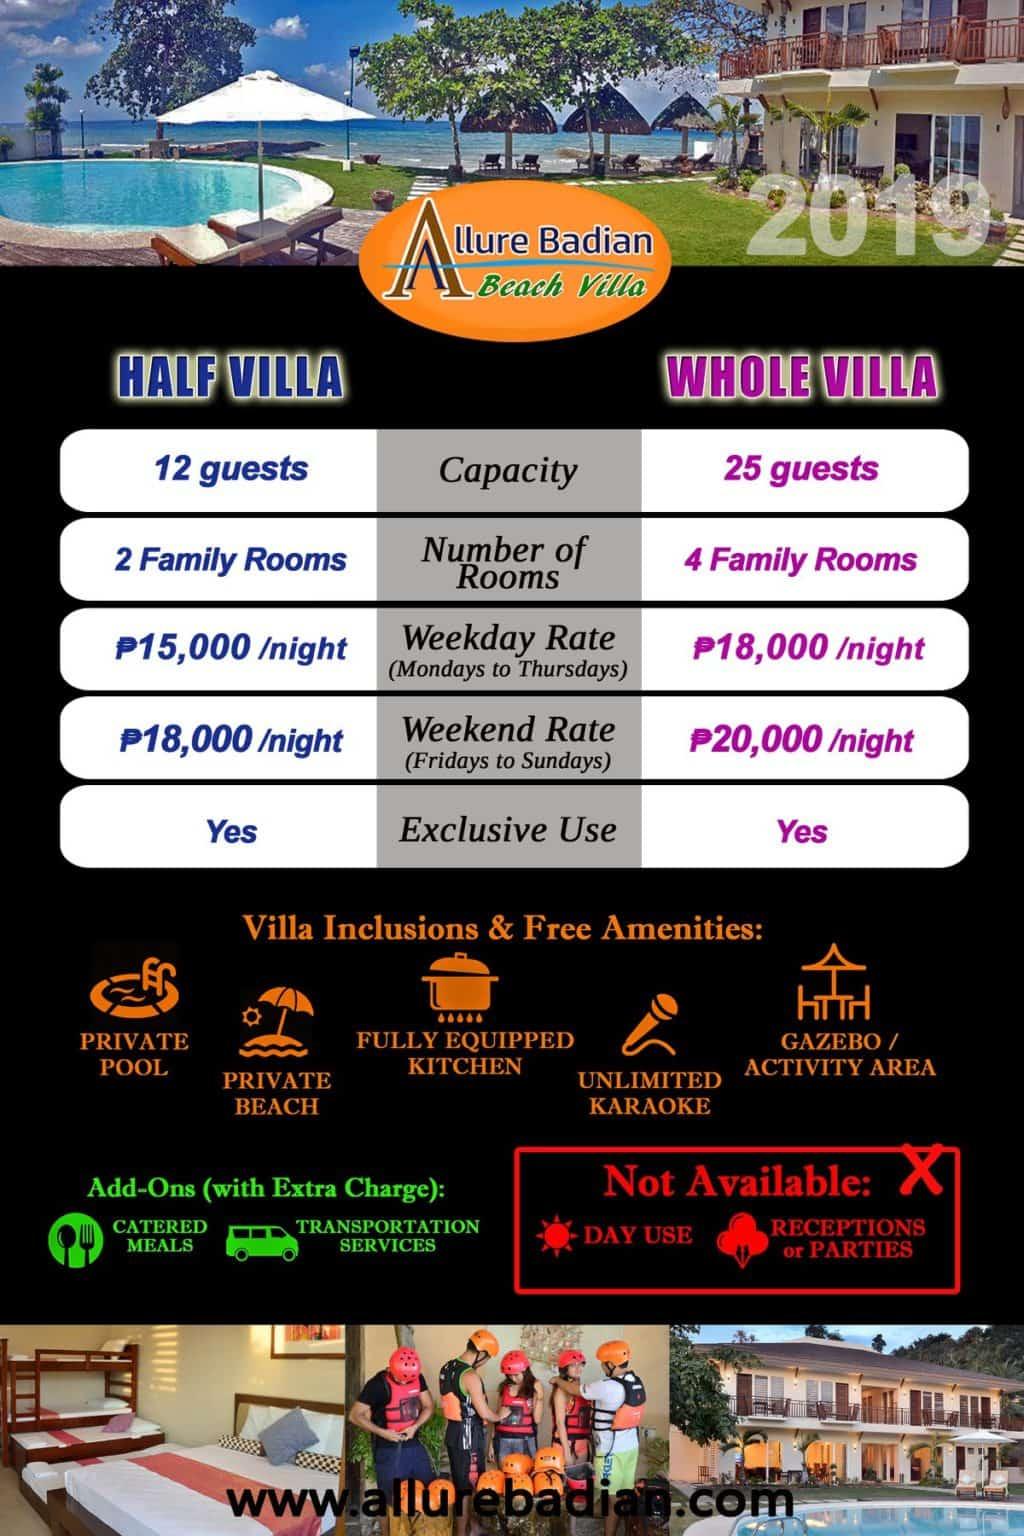 Allure Badian Beach Villa Resort - Rates